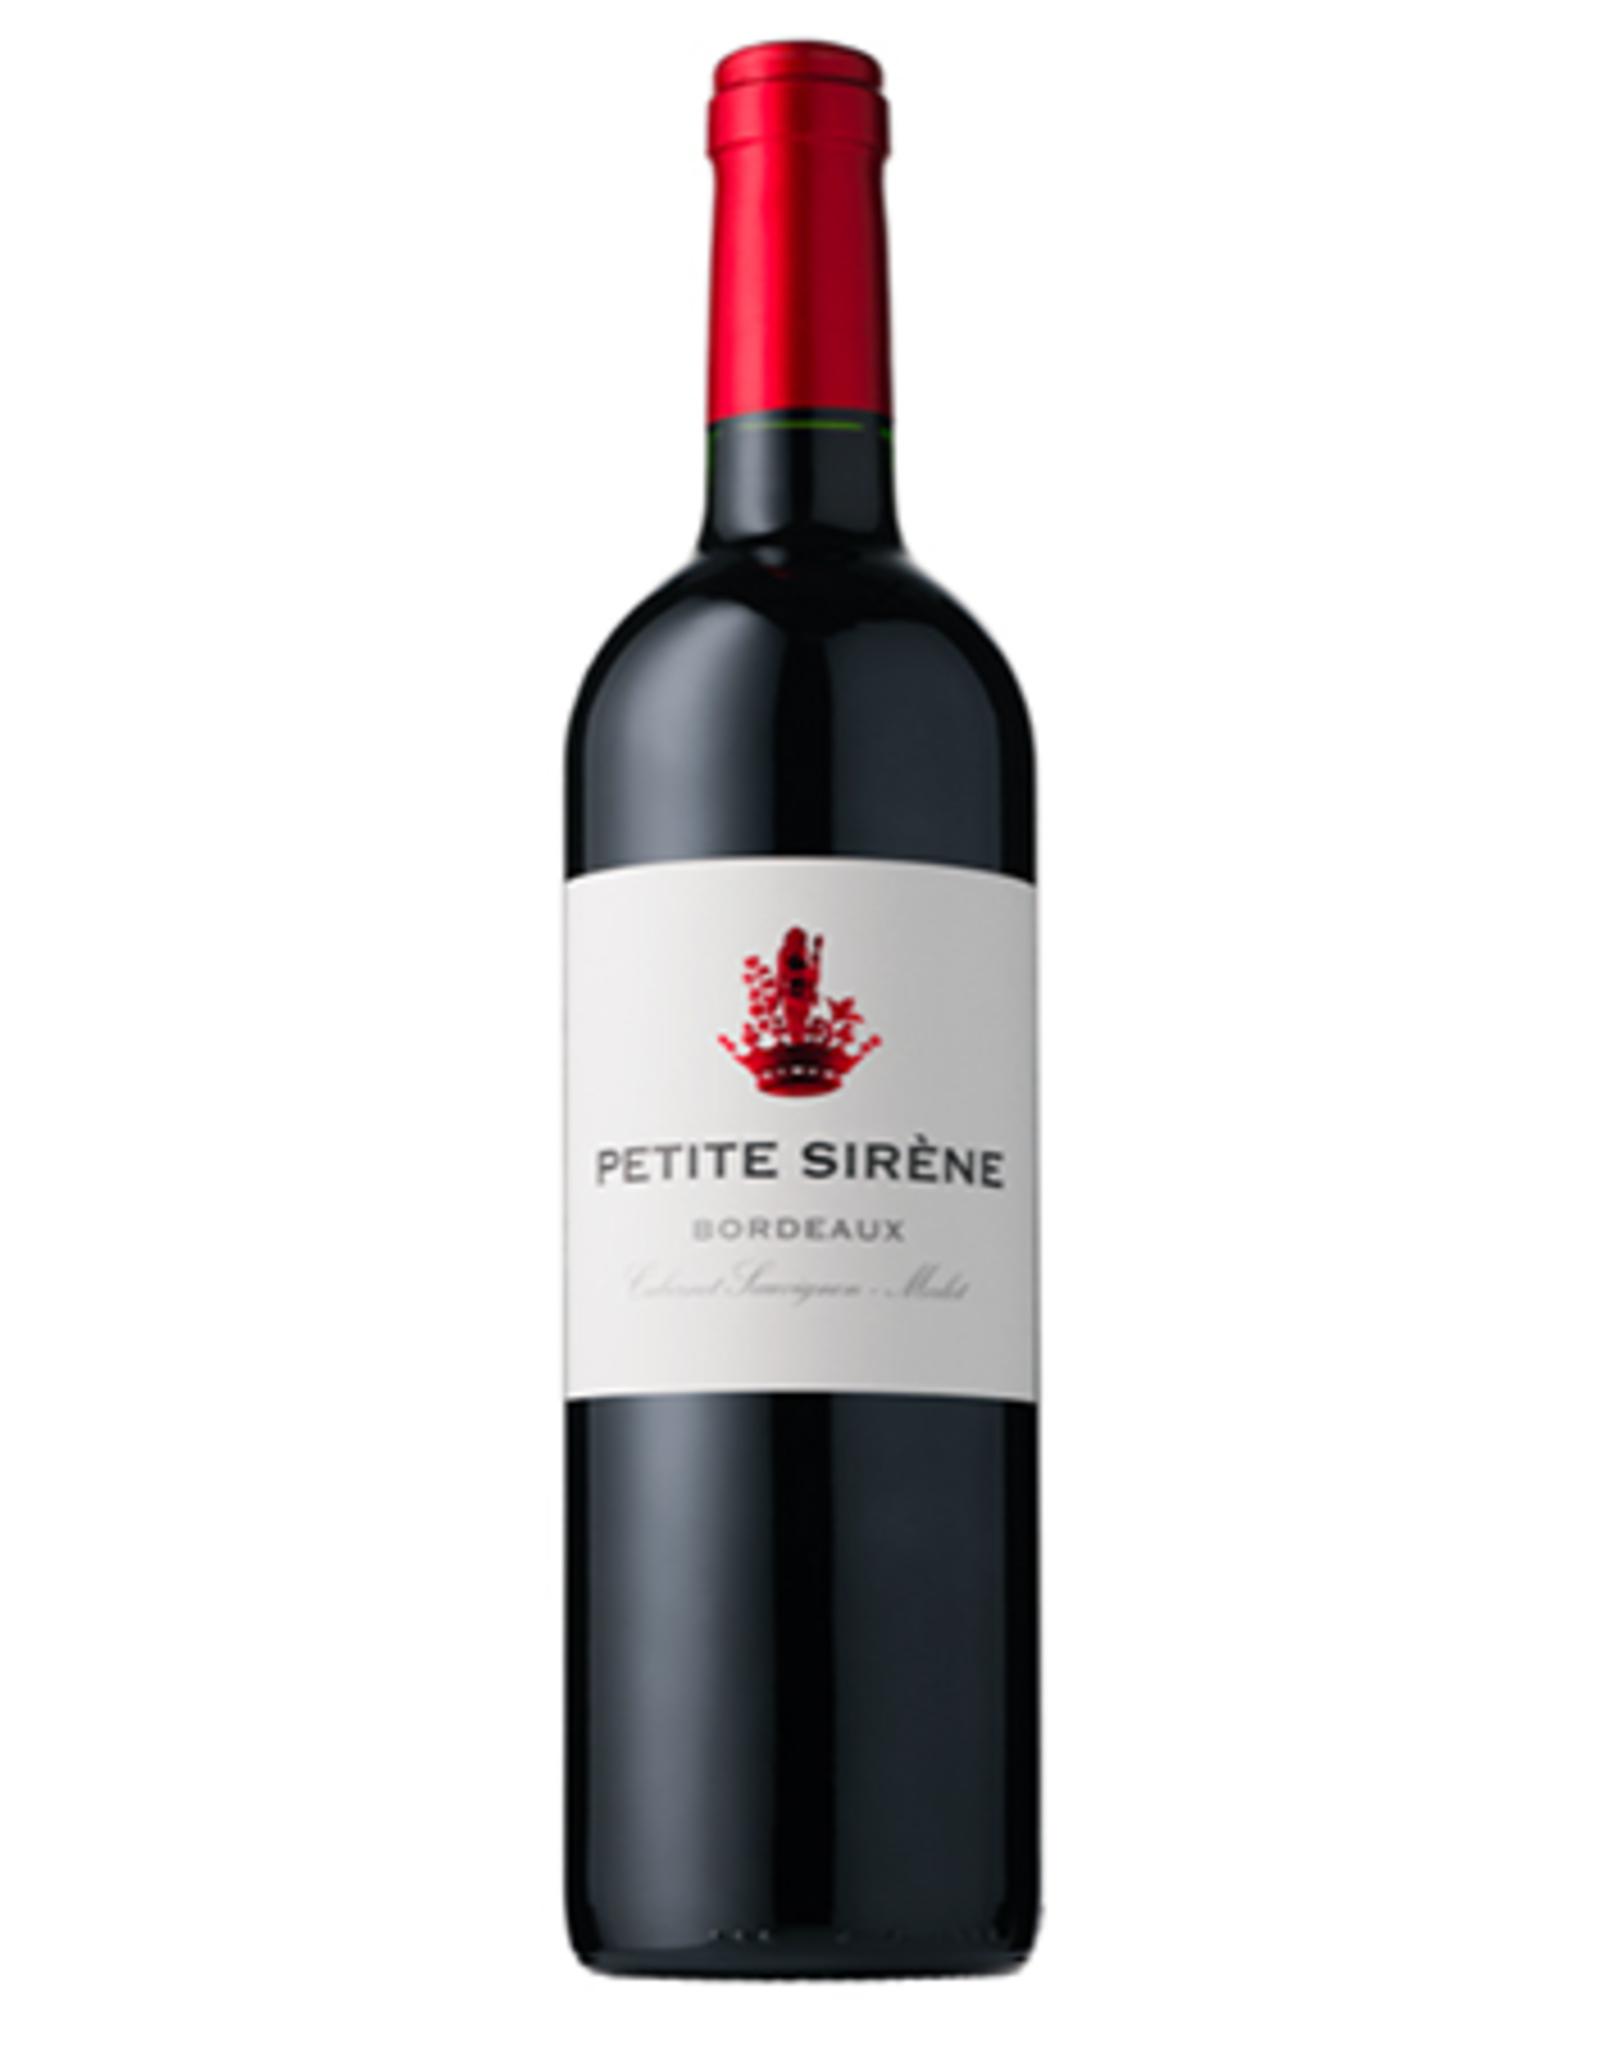 Petite Sirene Bordeaux 2015